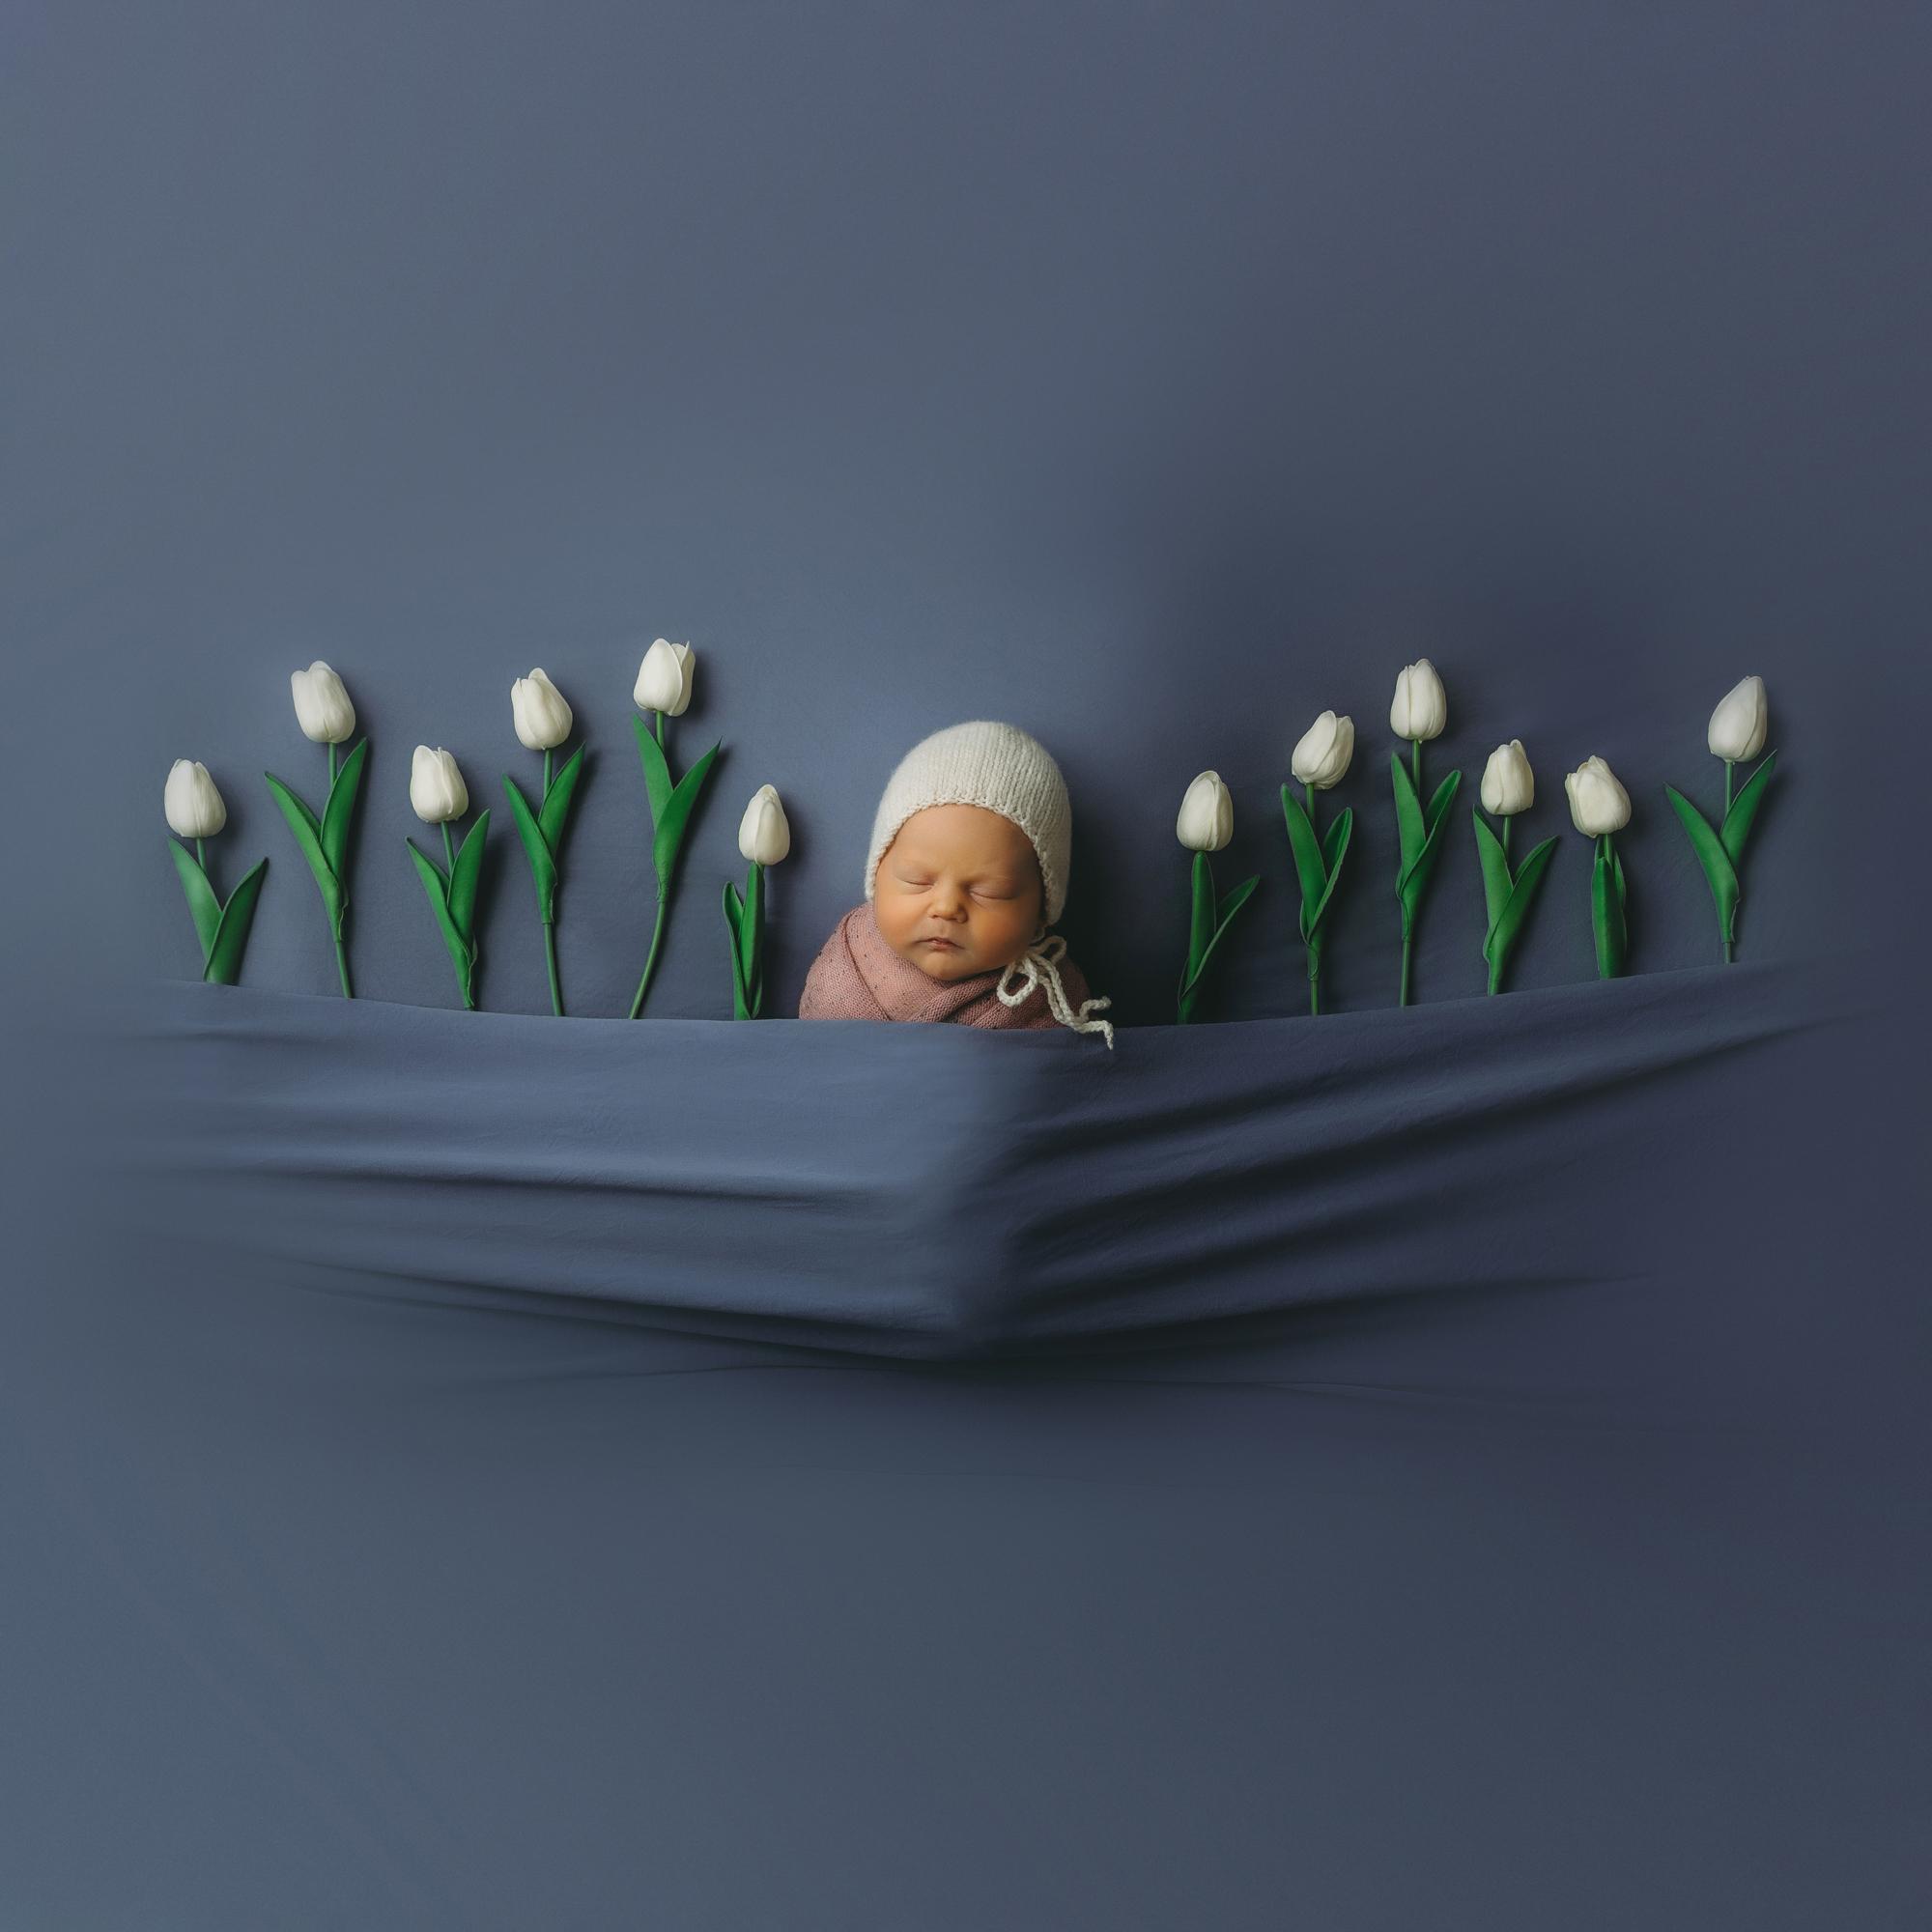 Newborn portrait with tulips